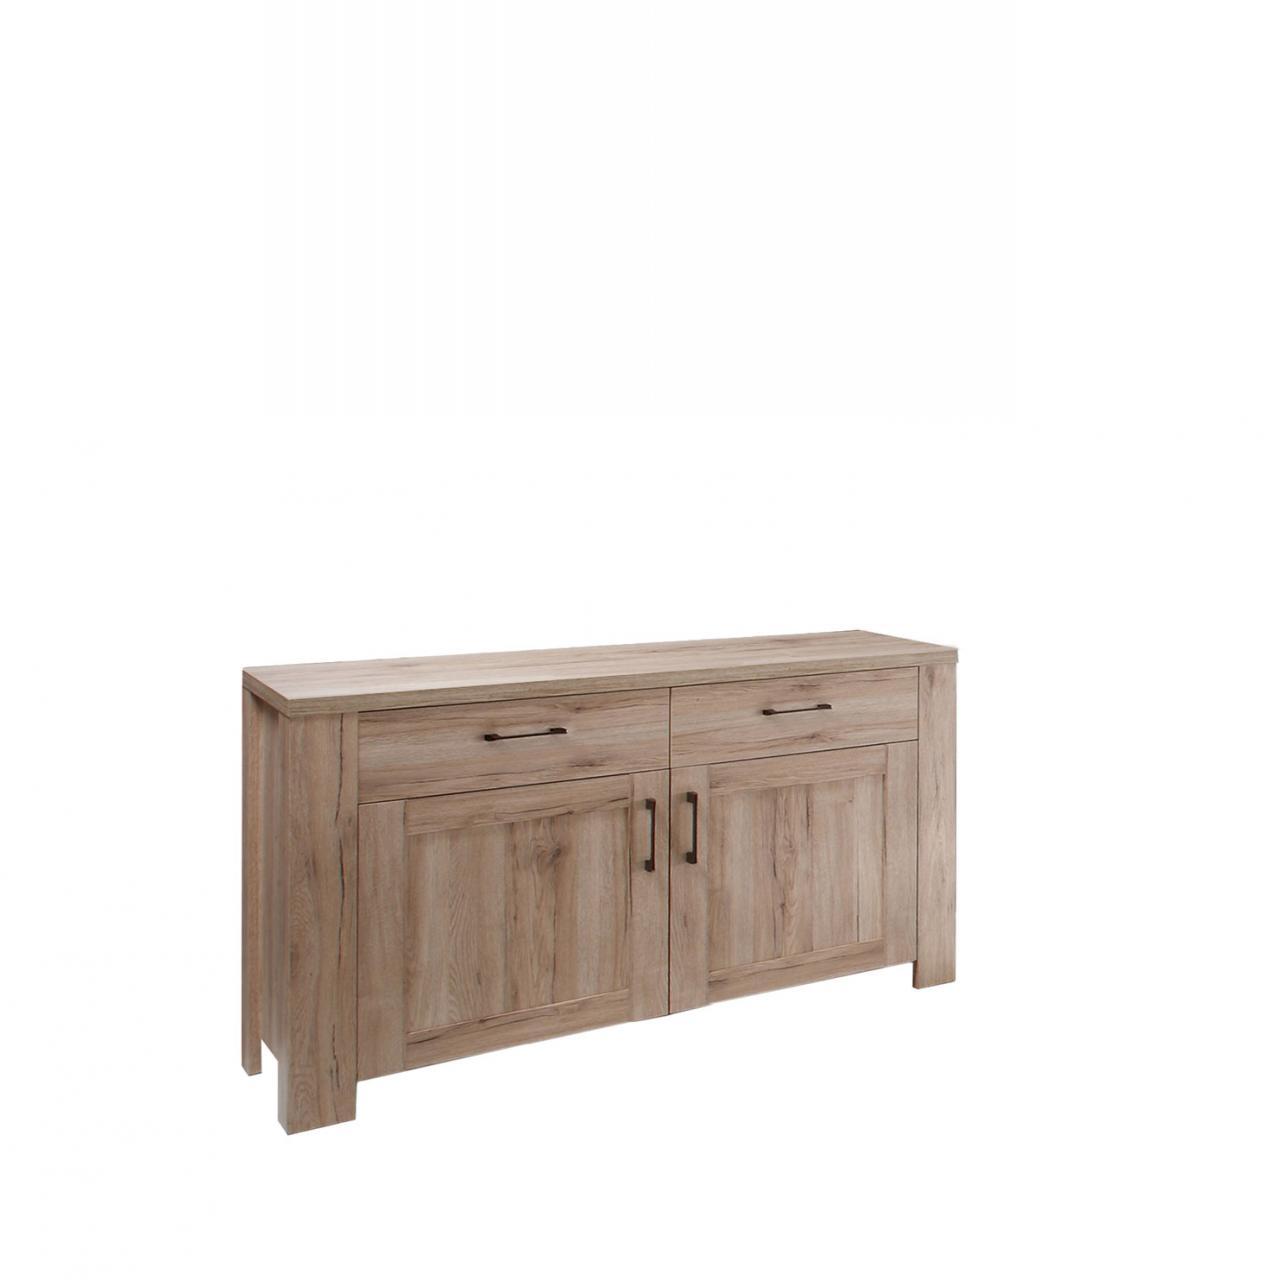 boxspringbett bx290 180x200 cm boxspringbett betten. Black Bedroom Furniture Sets. Home Design Ideas